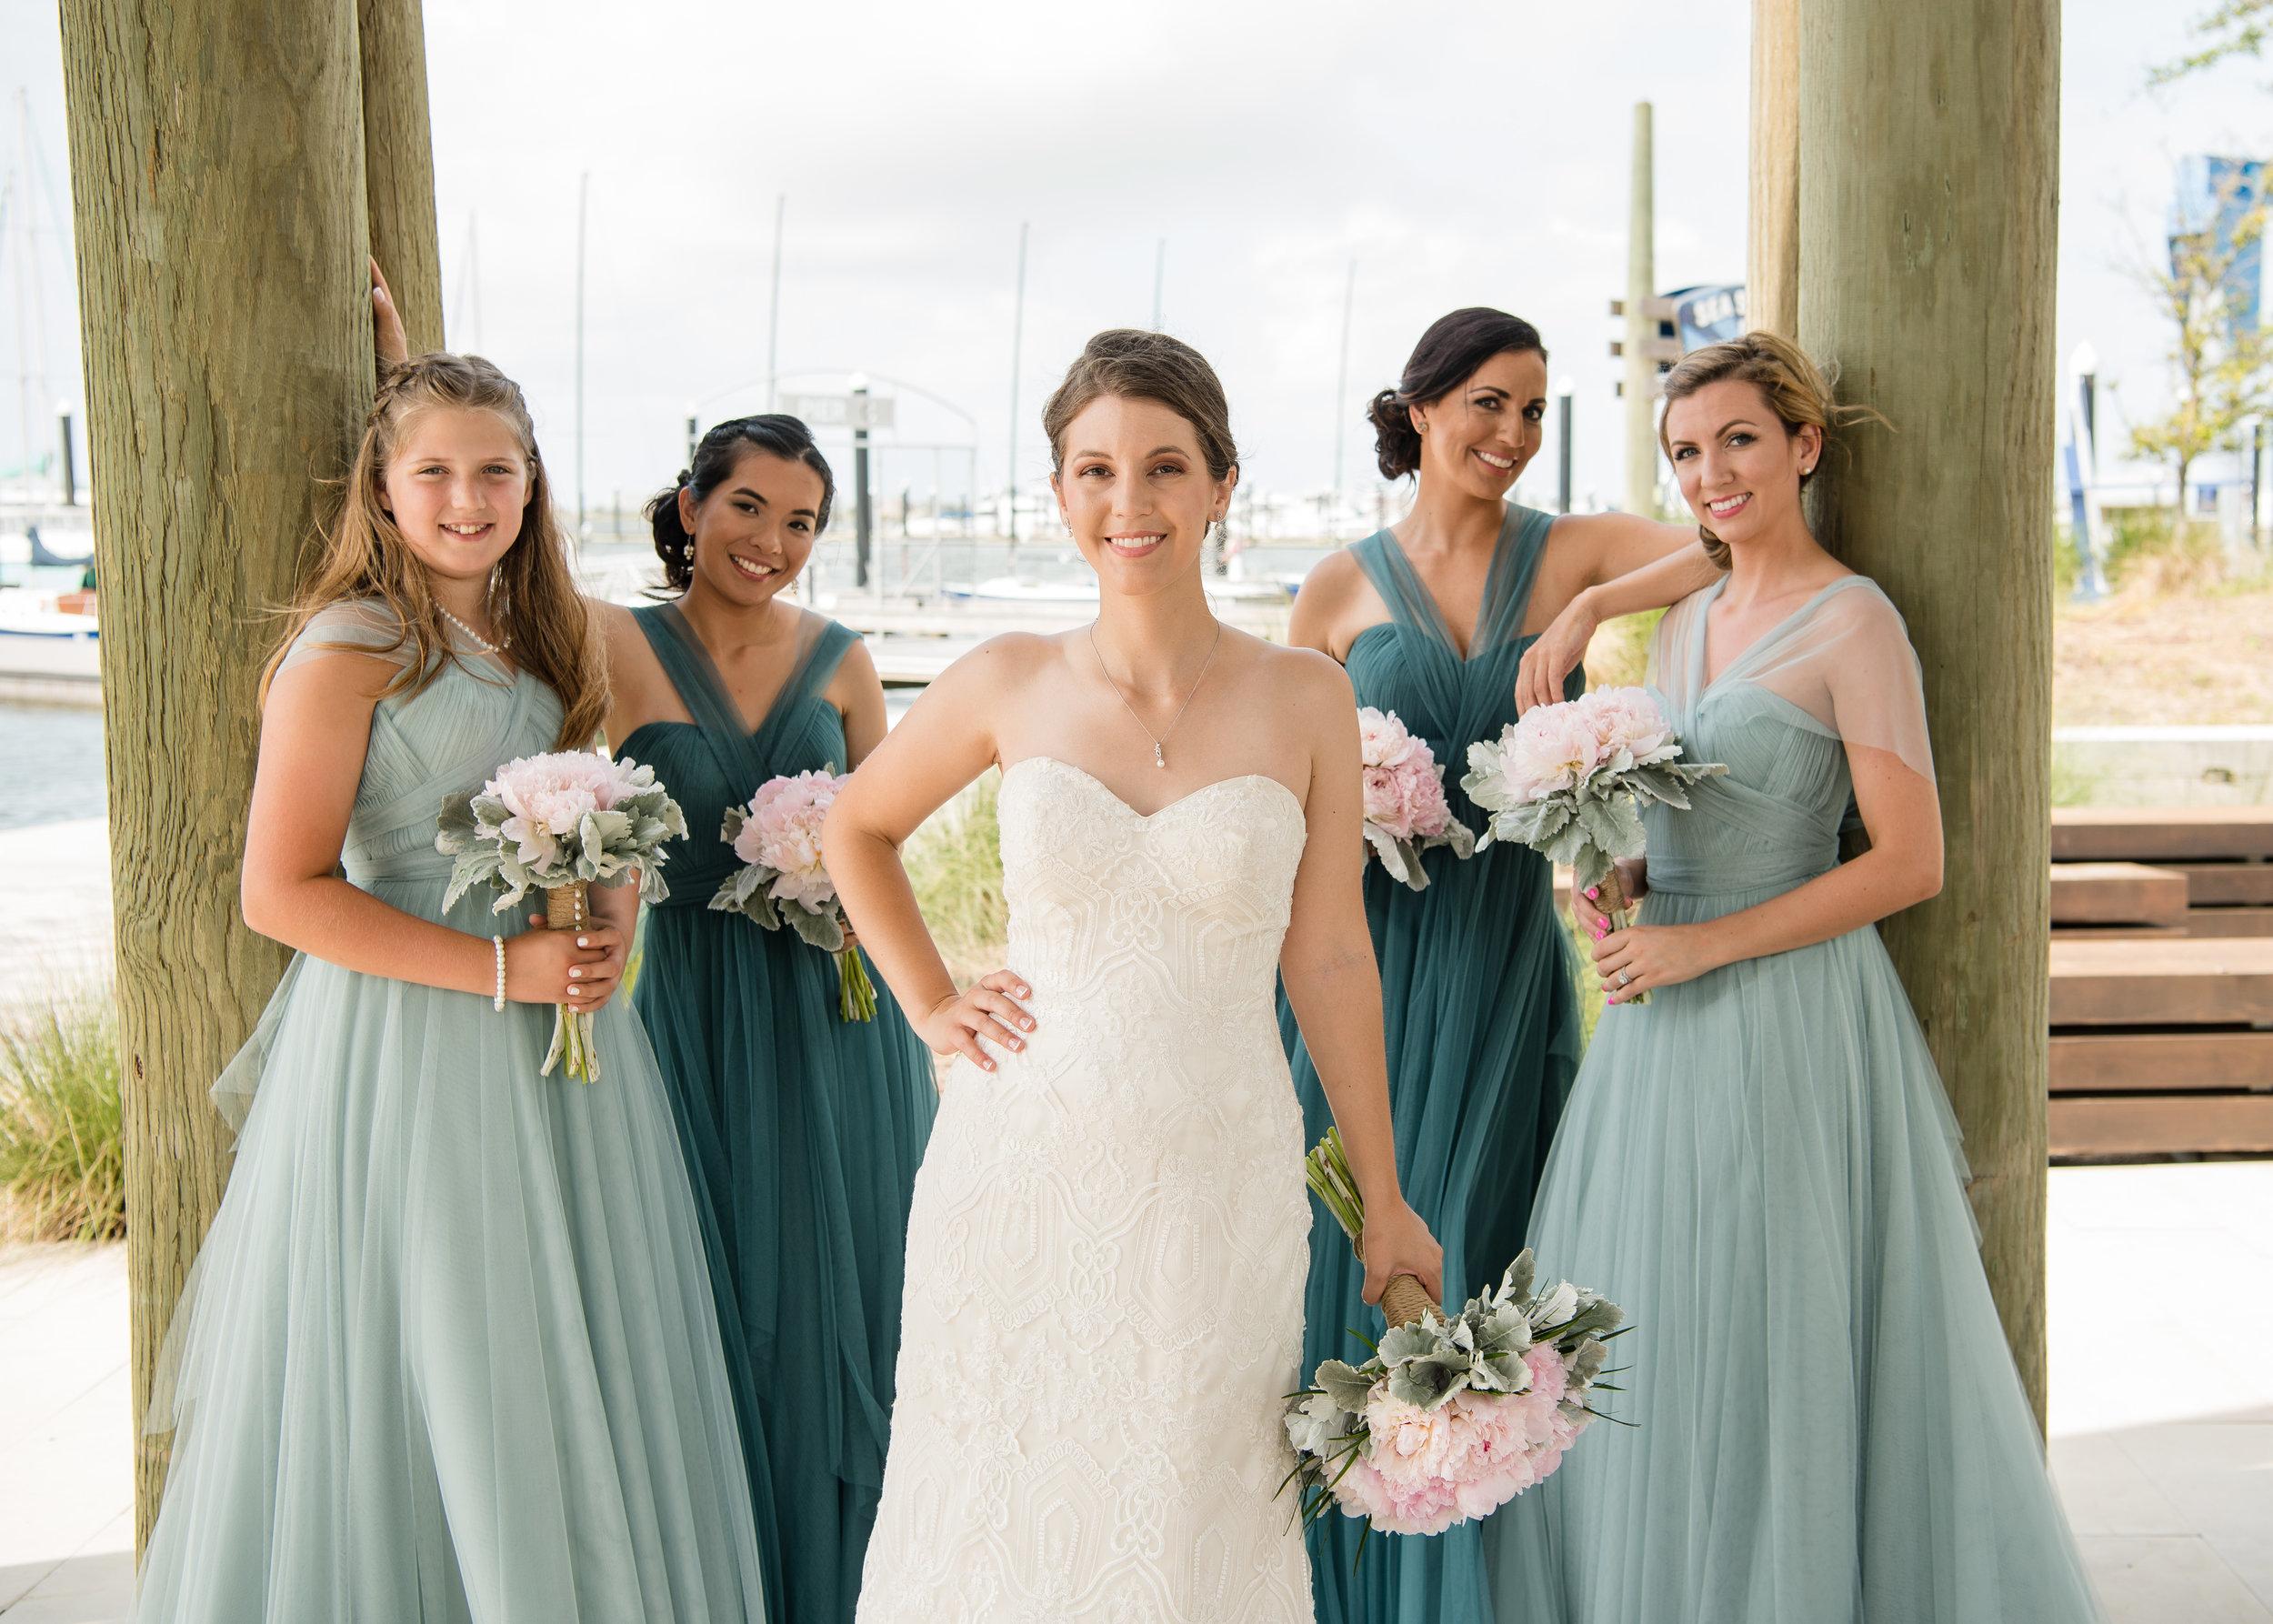 Bridal Wedding Party